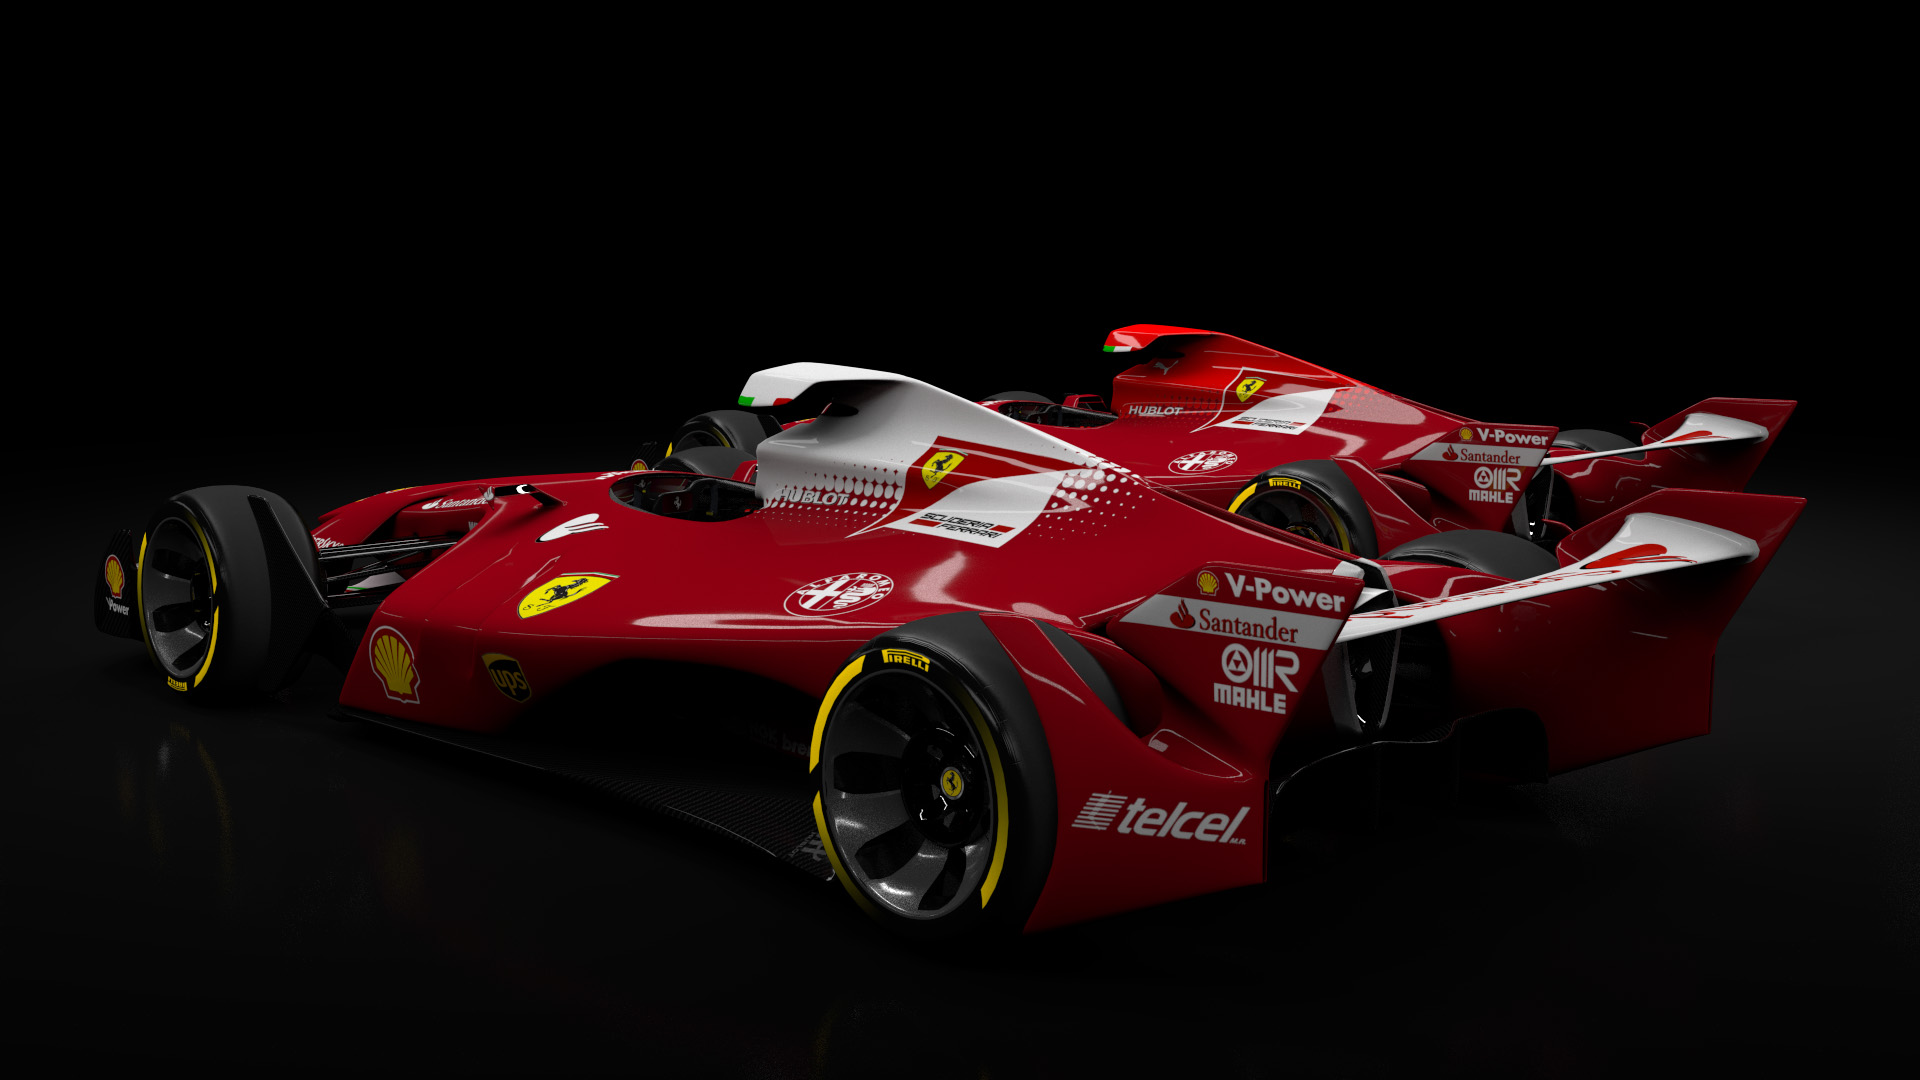 Ferrari F1 Concept 1 01 For Ac Released Virtualr Net